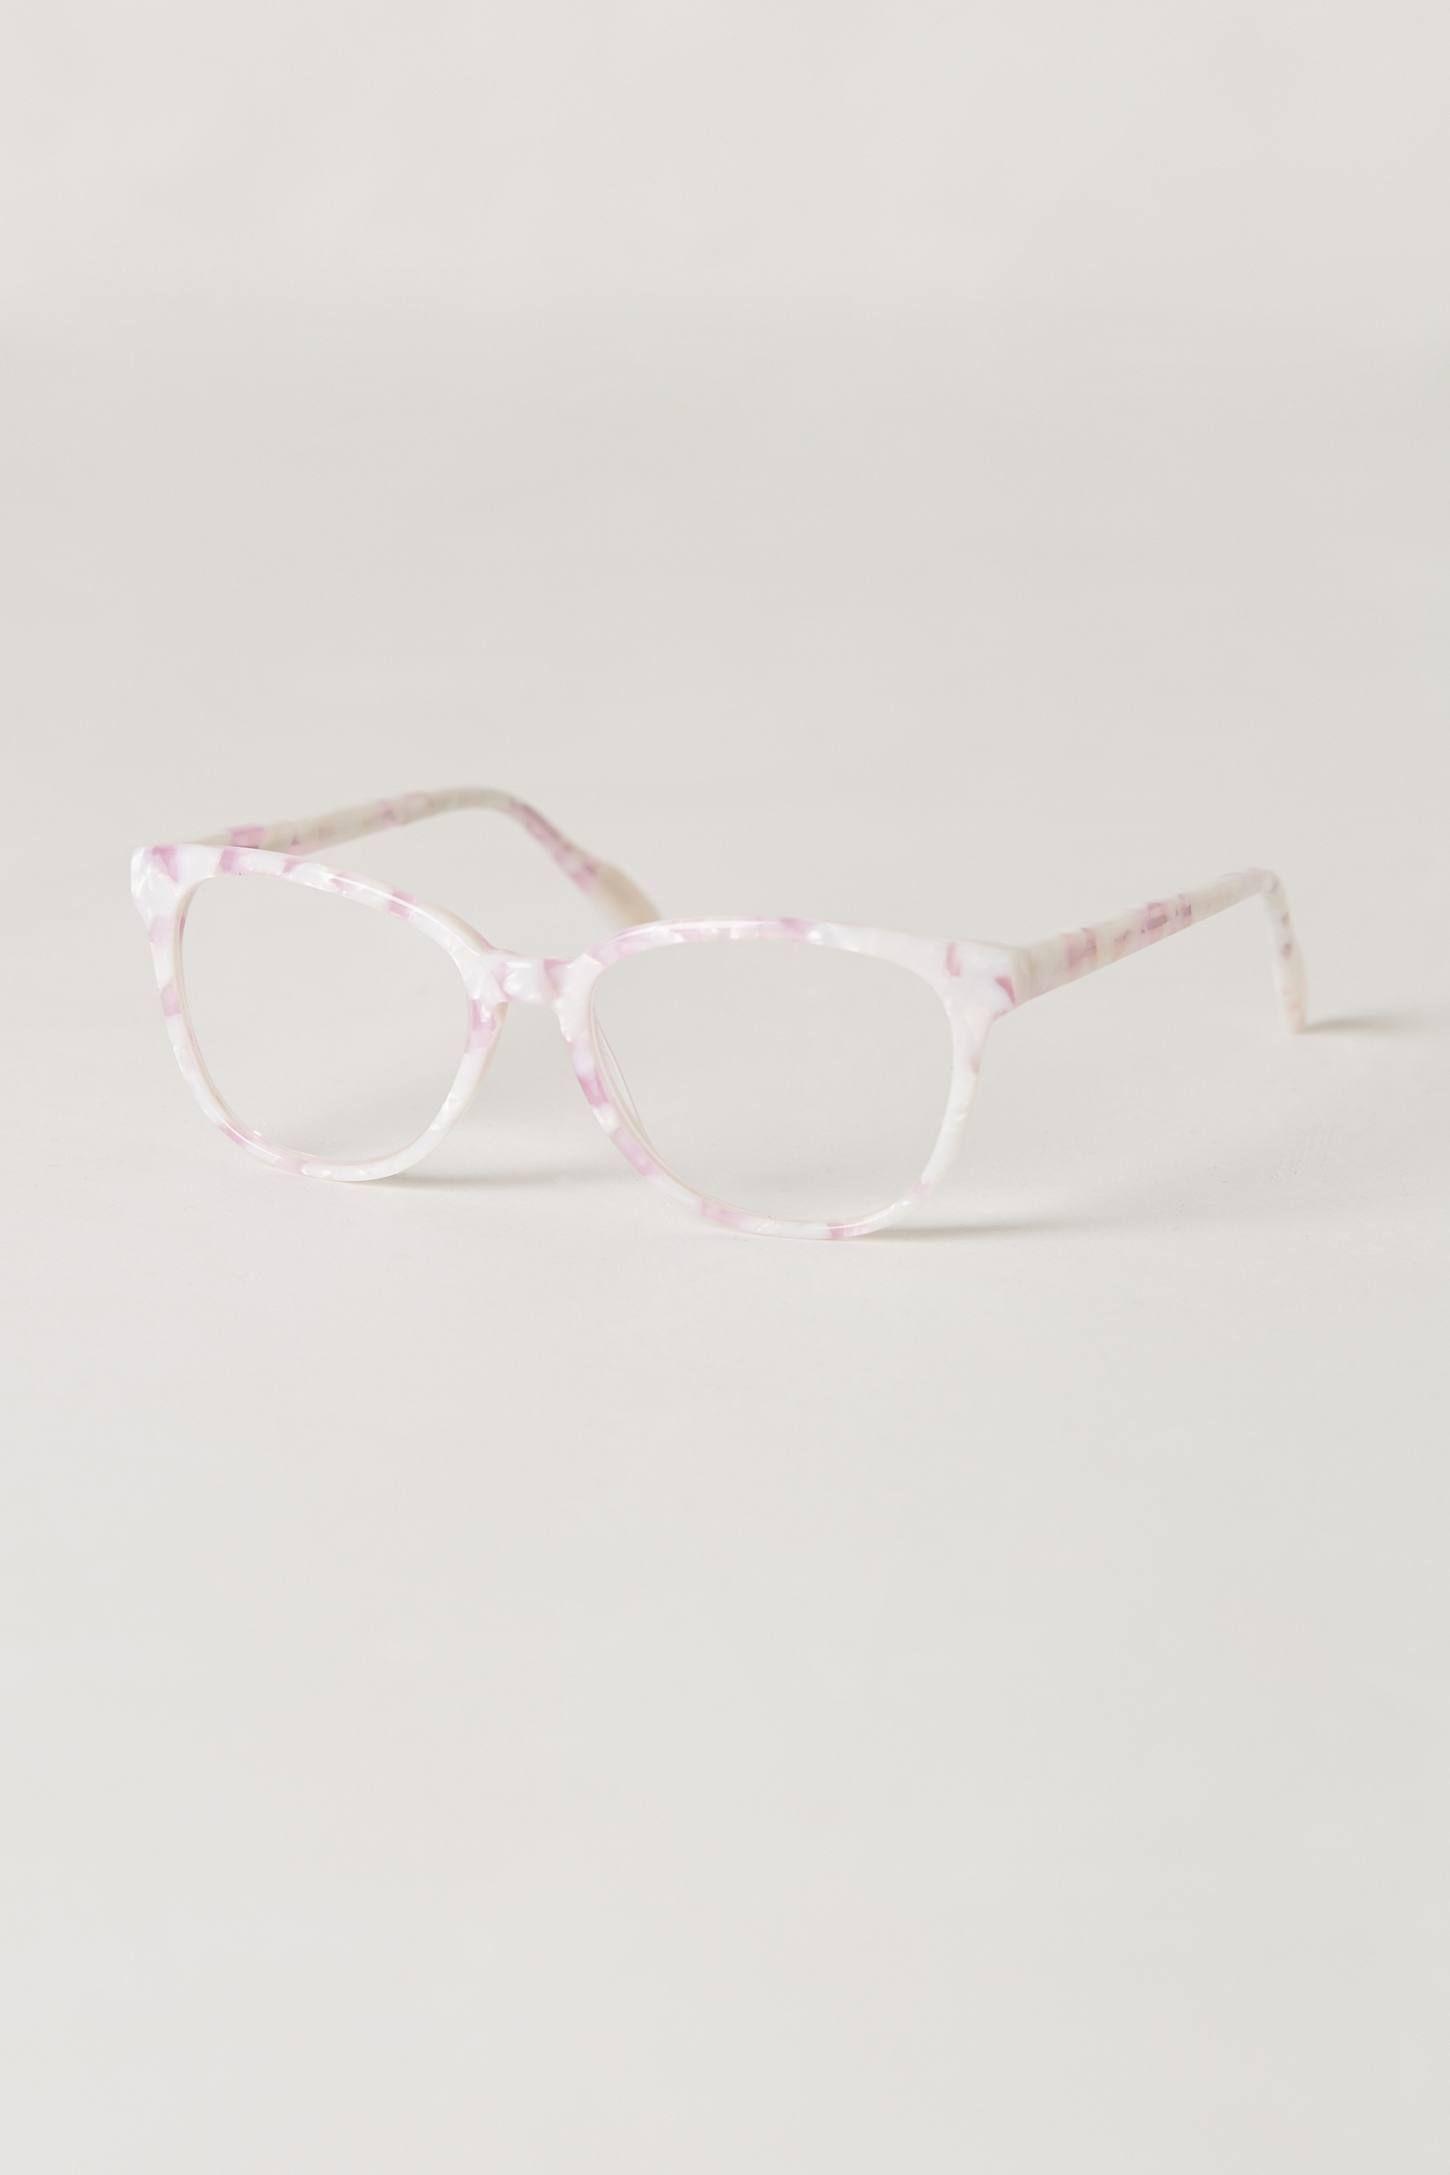 Pastel Reading Glasses - anthropologie.com